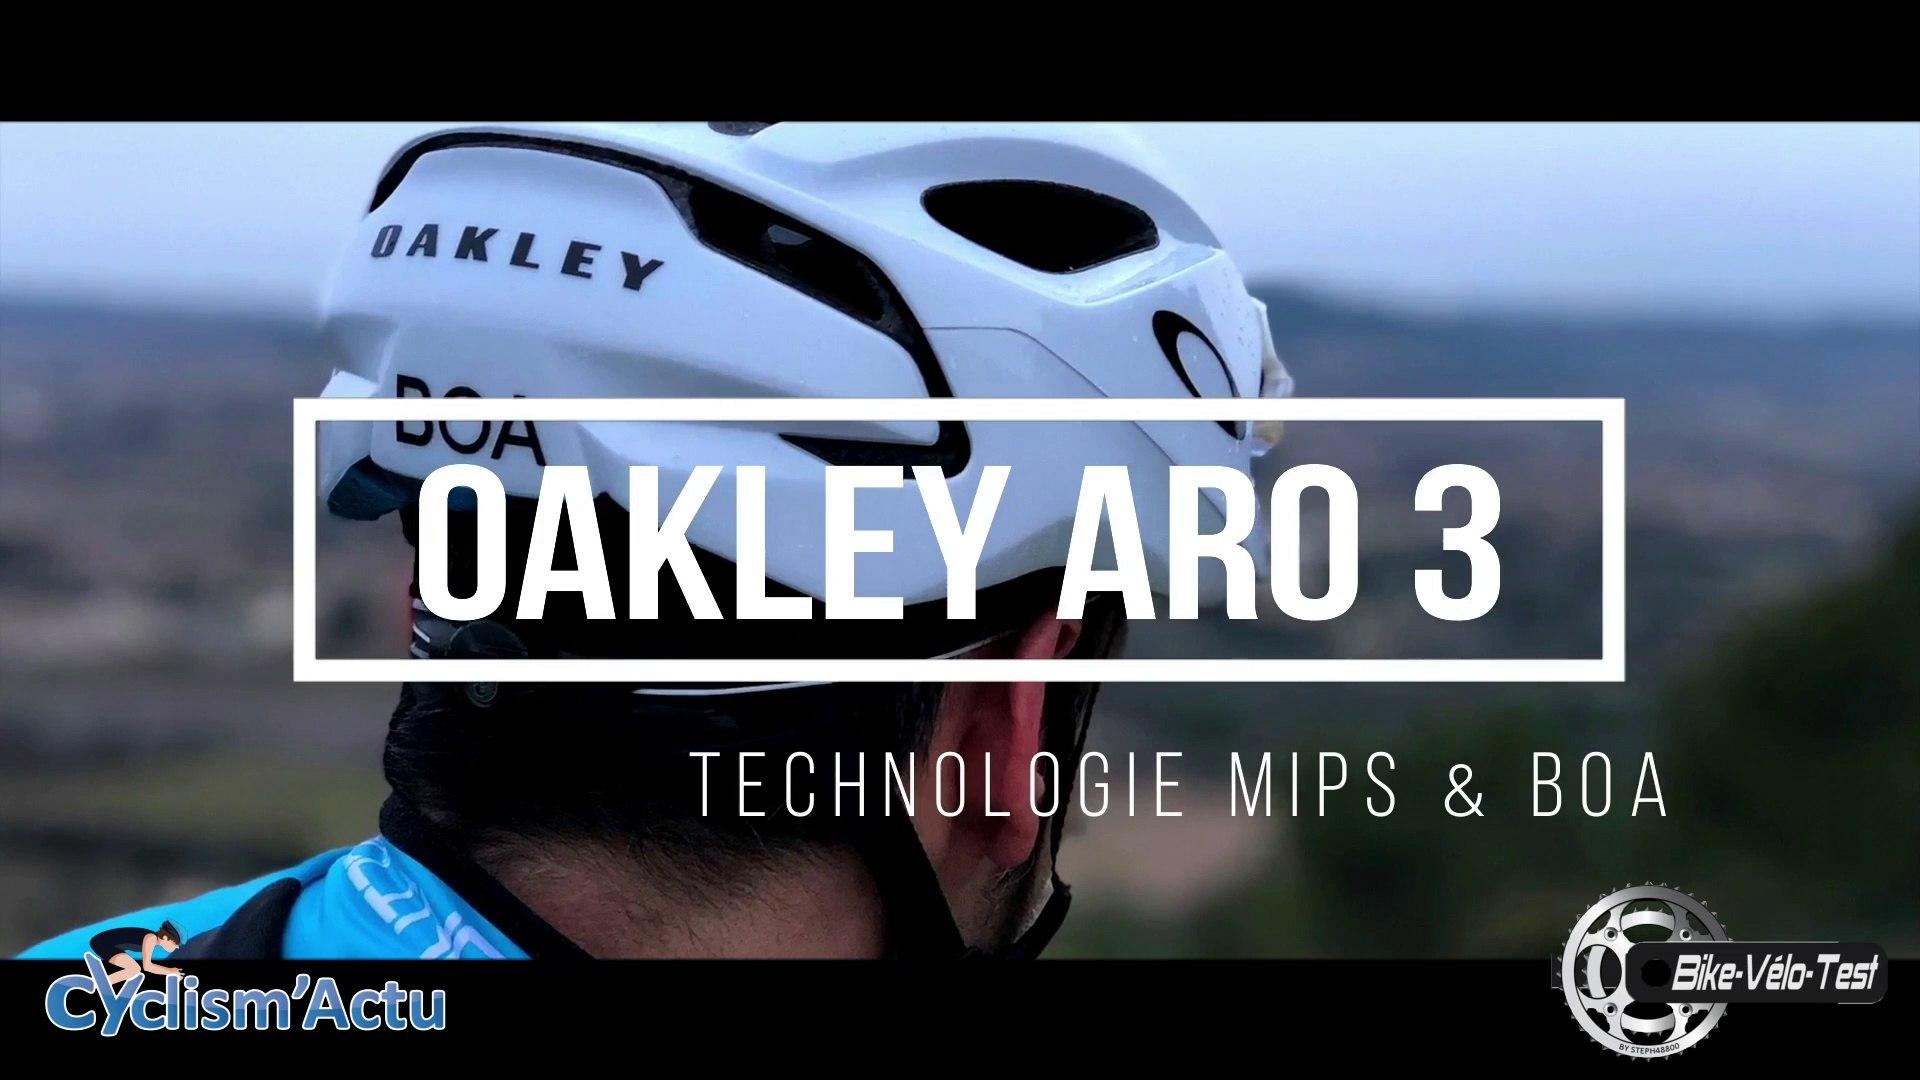 Bike Vélo Test - Cyclism'Actu a testé le Oakley ARO 3 Boa